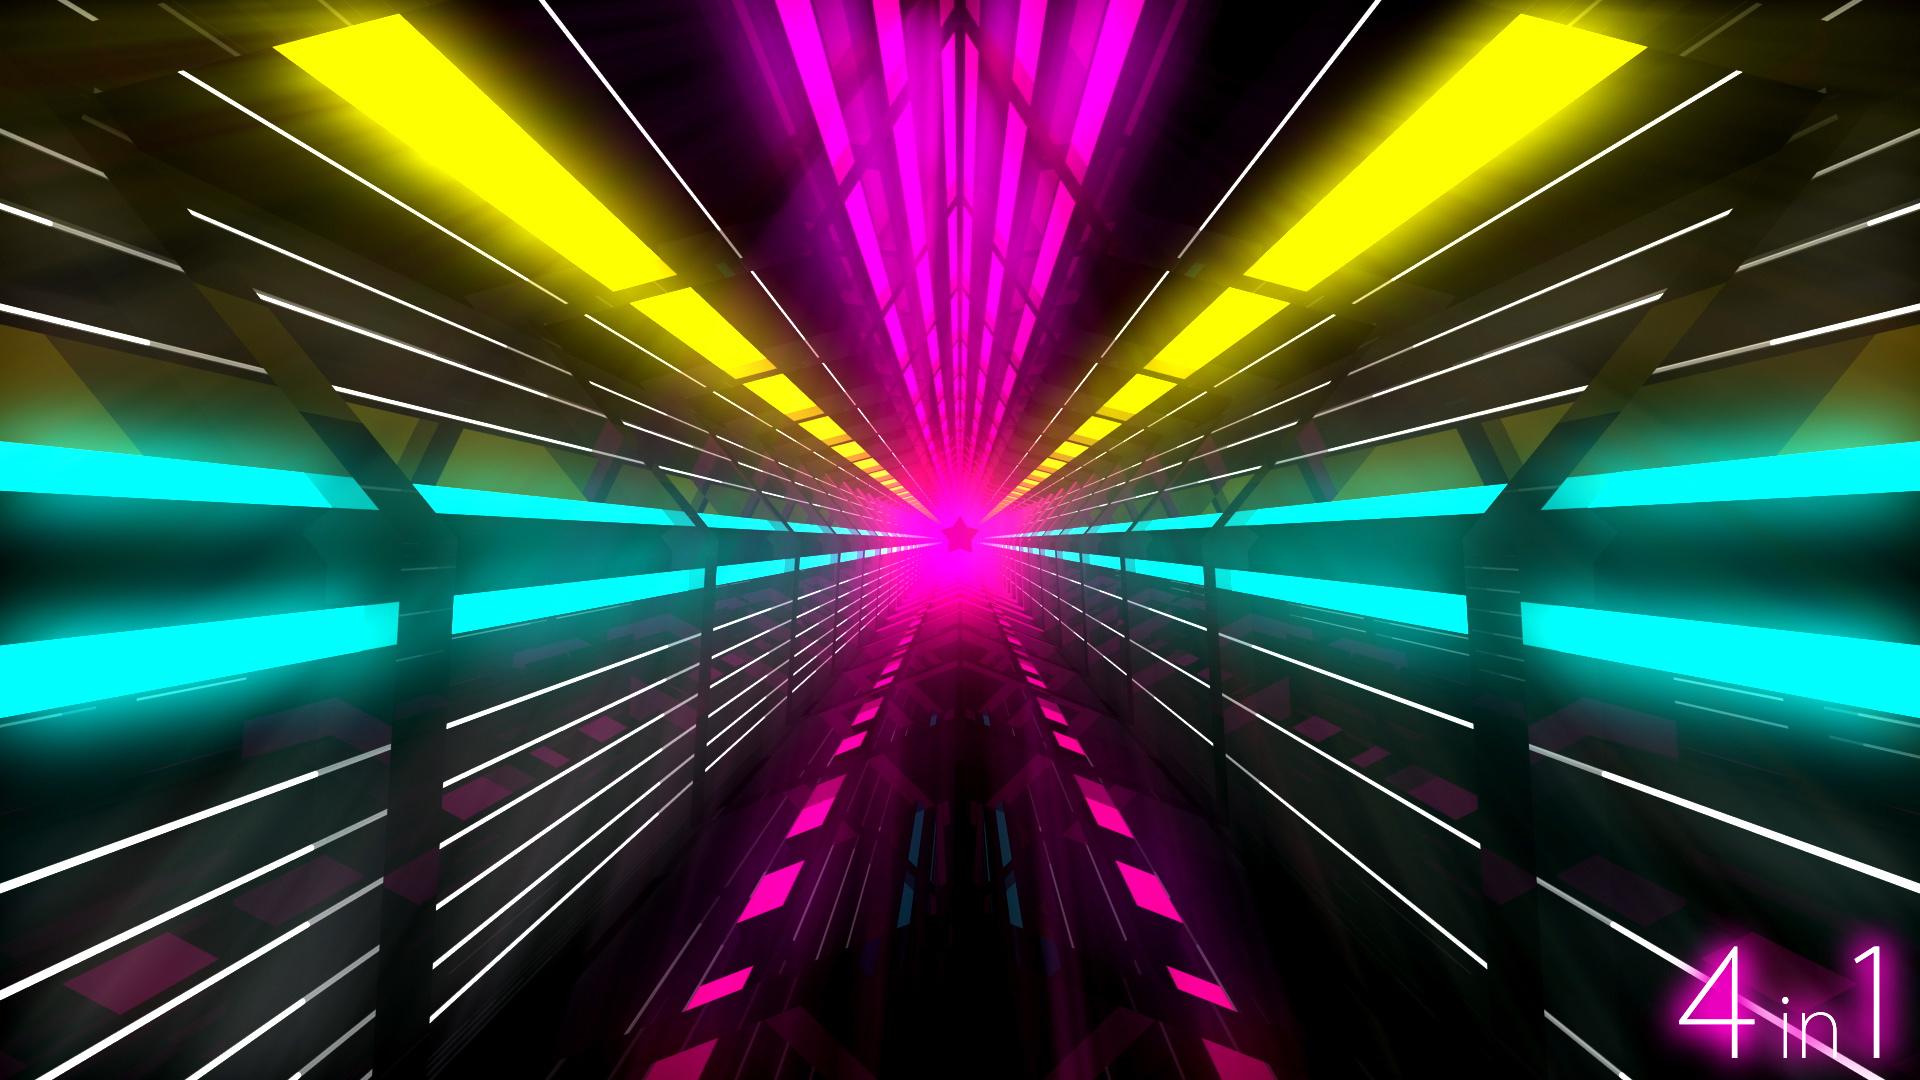 Animated 3d Wallpaper Gifs Looping Vj Light Tunnel